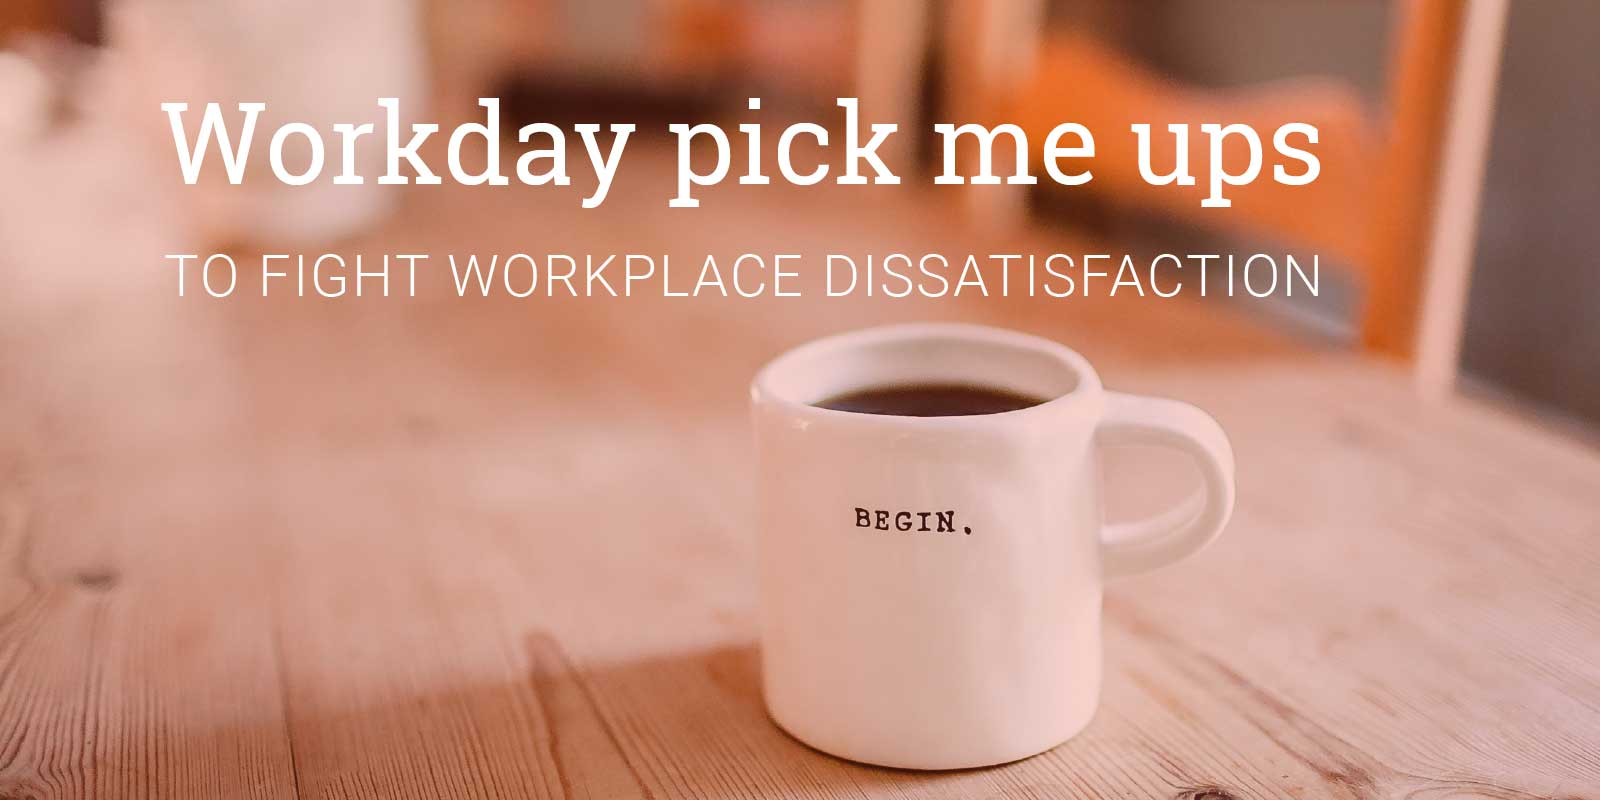 workday-pick-me-up-1.jpg